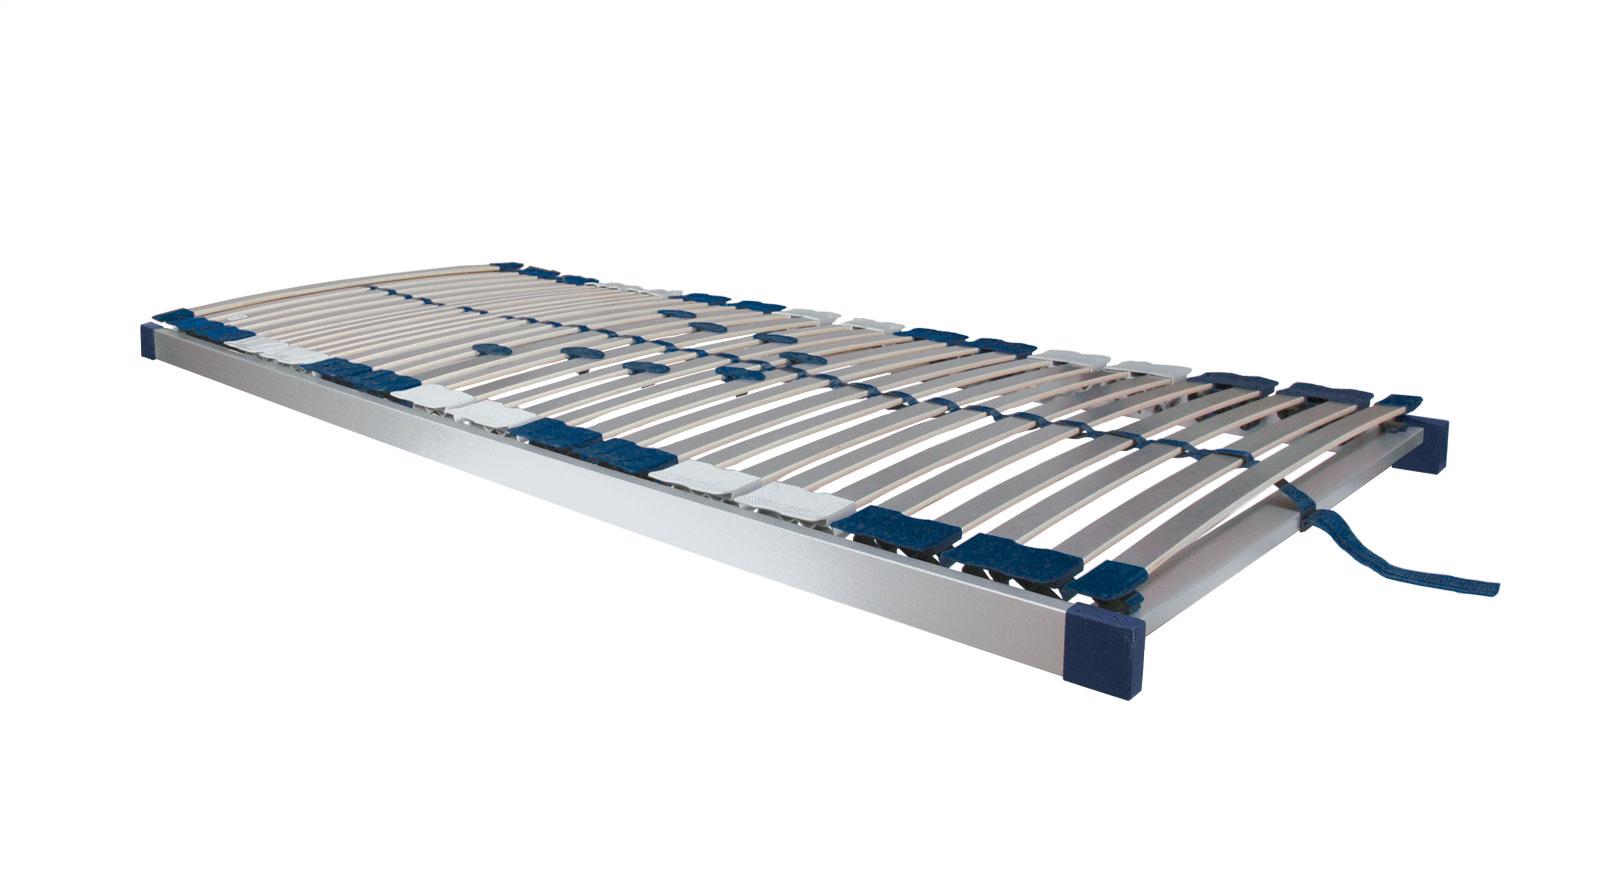 Unverstellbarer Lattenrost Vitaflex mit stabilsierendem Mittelband